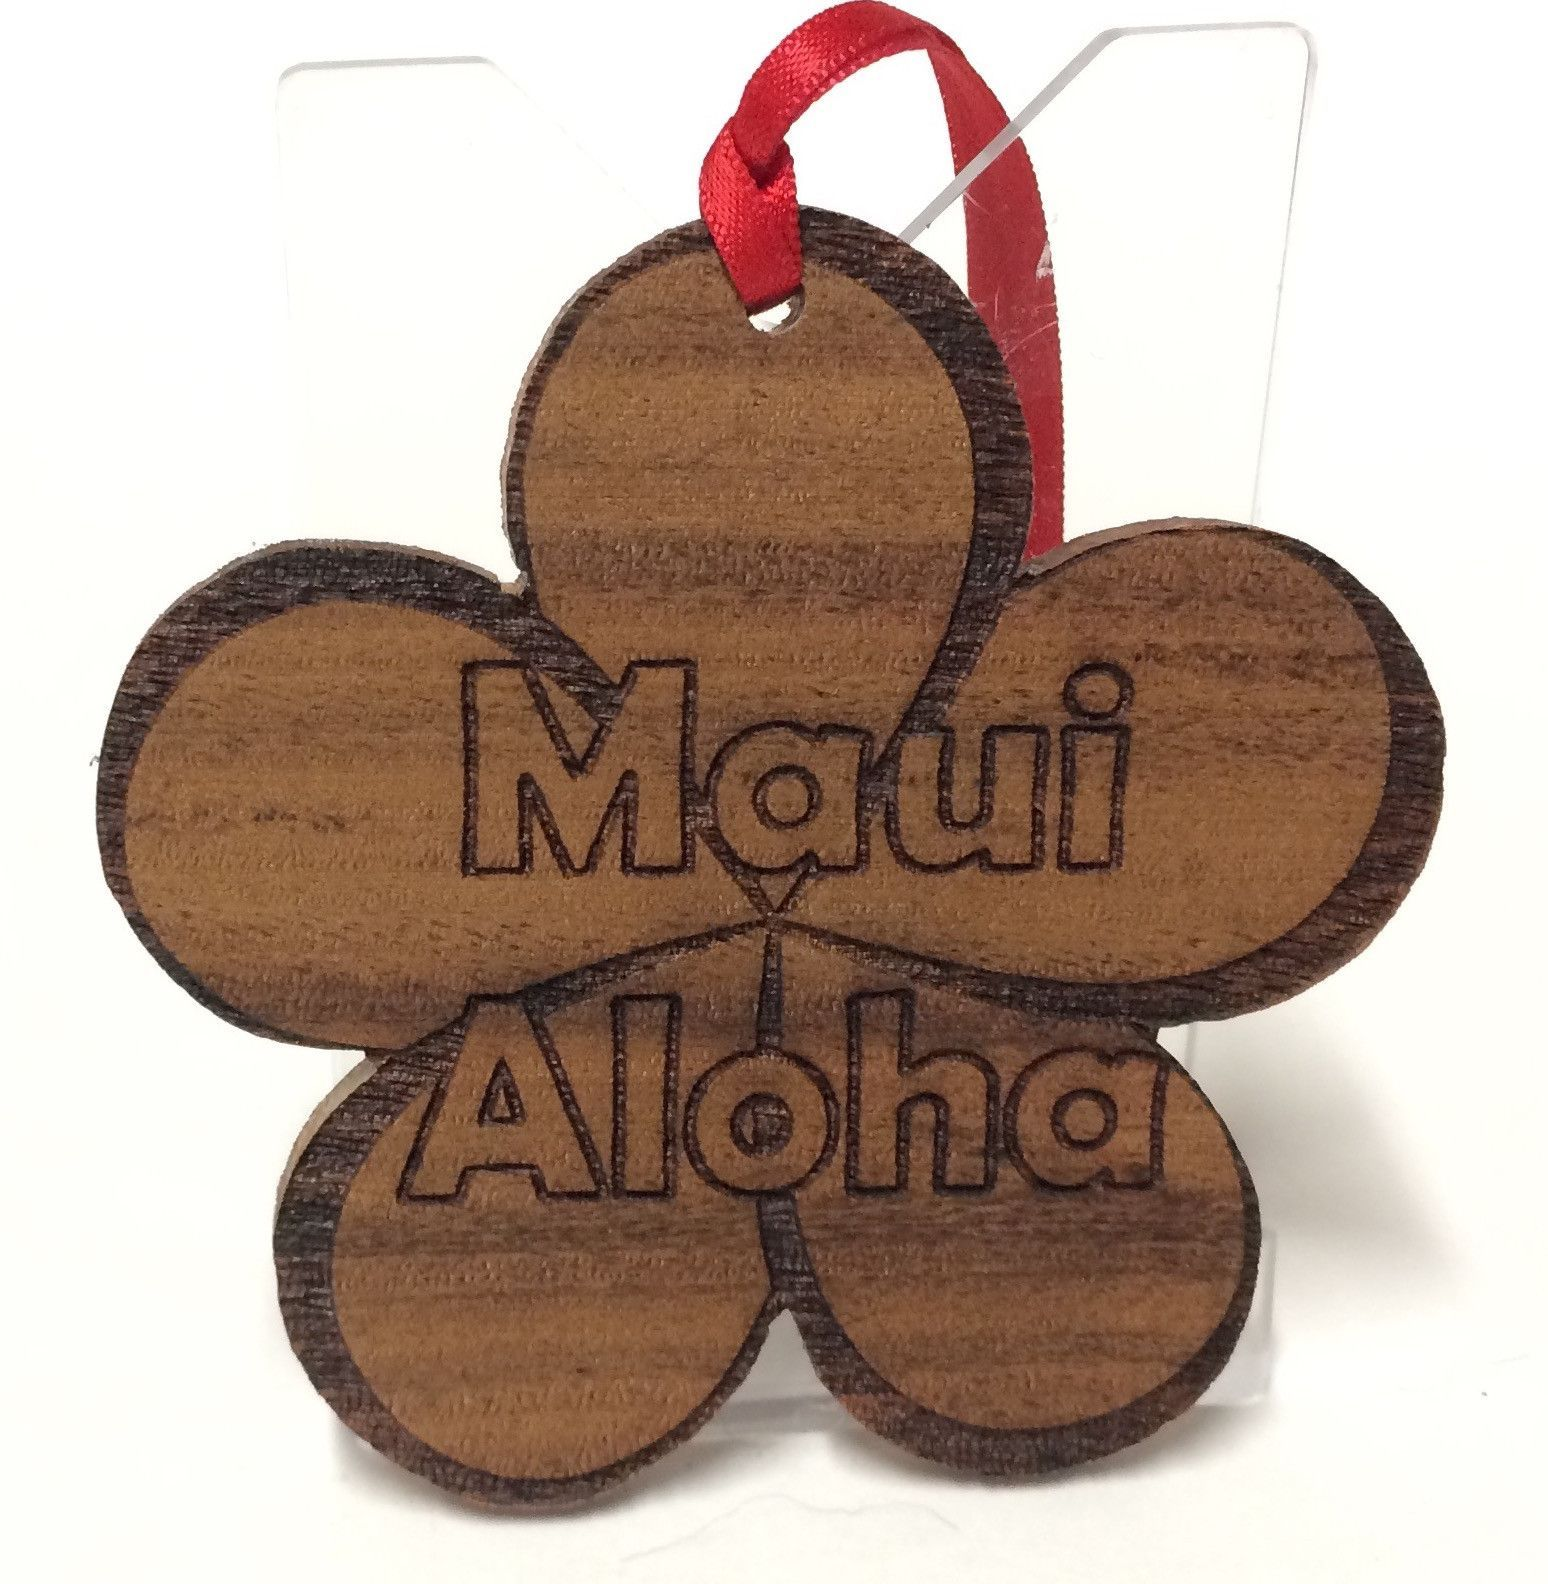 Hawaiian Koa wood Plumeria cutout Christmas ornament crafted by an artist from the Hawaiian Islands.